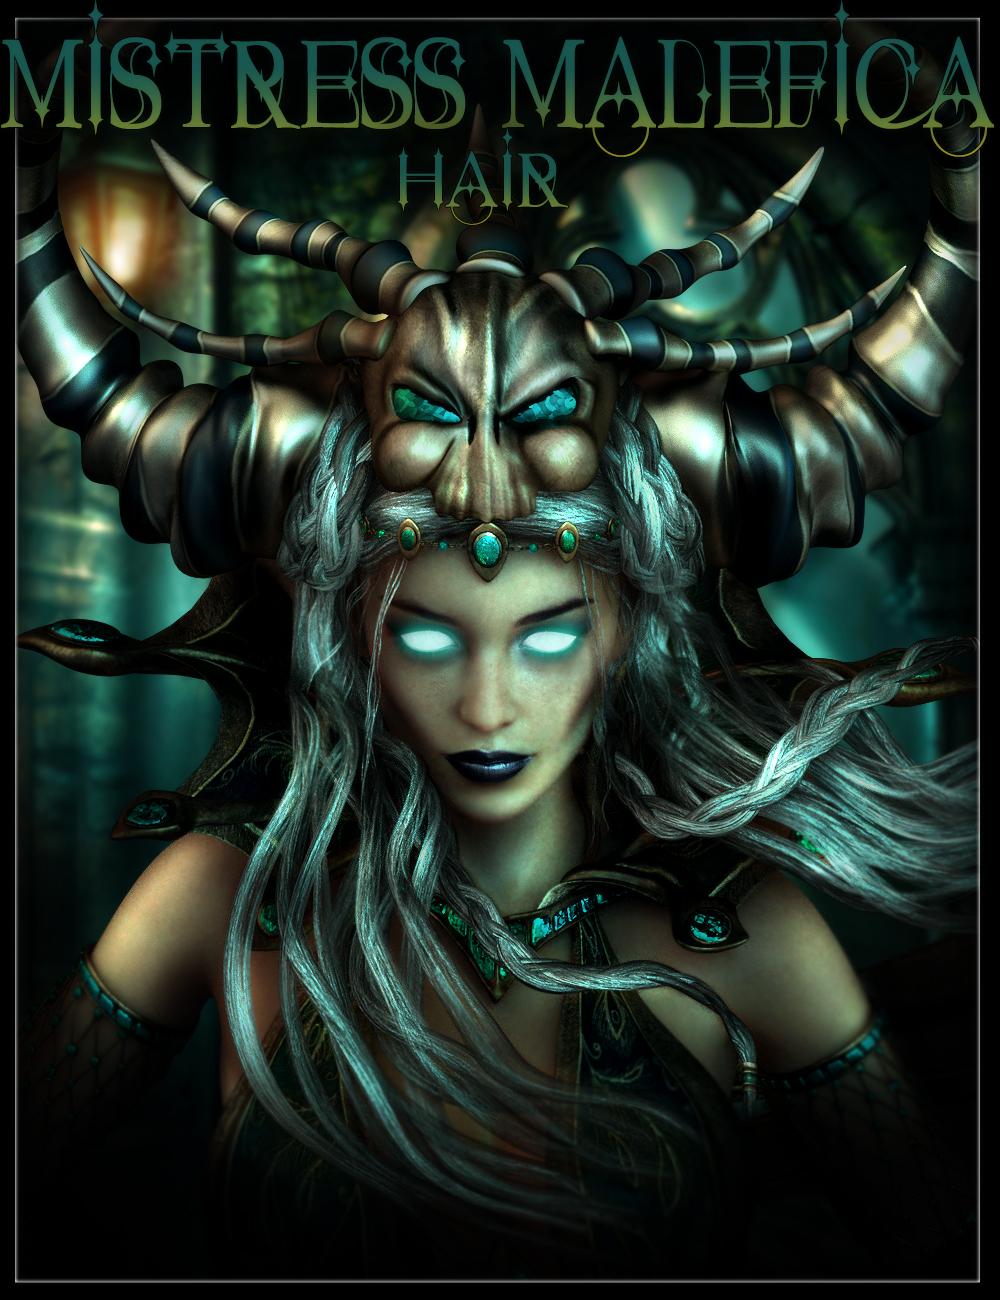 Mistress Malefica Hair by: IgnisSerpentus, 3D Models by Daz 3D